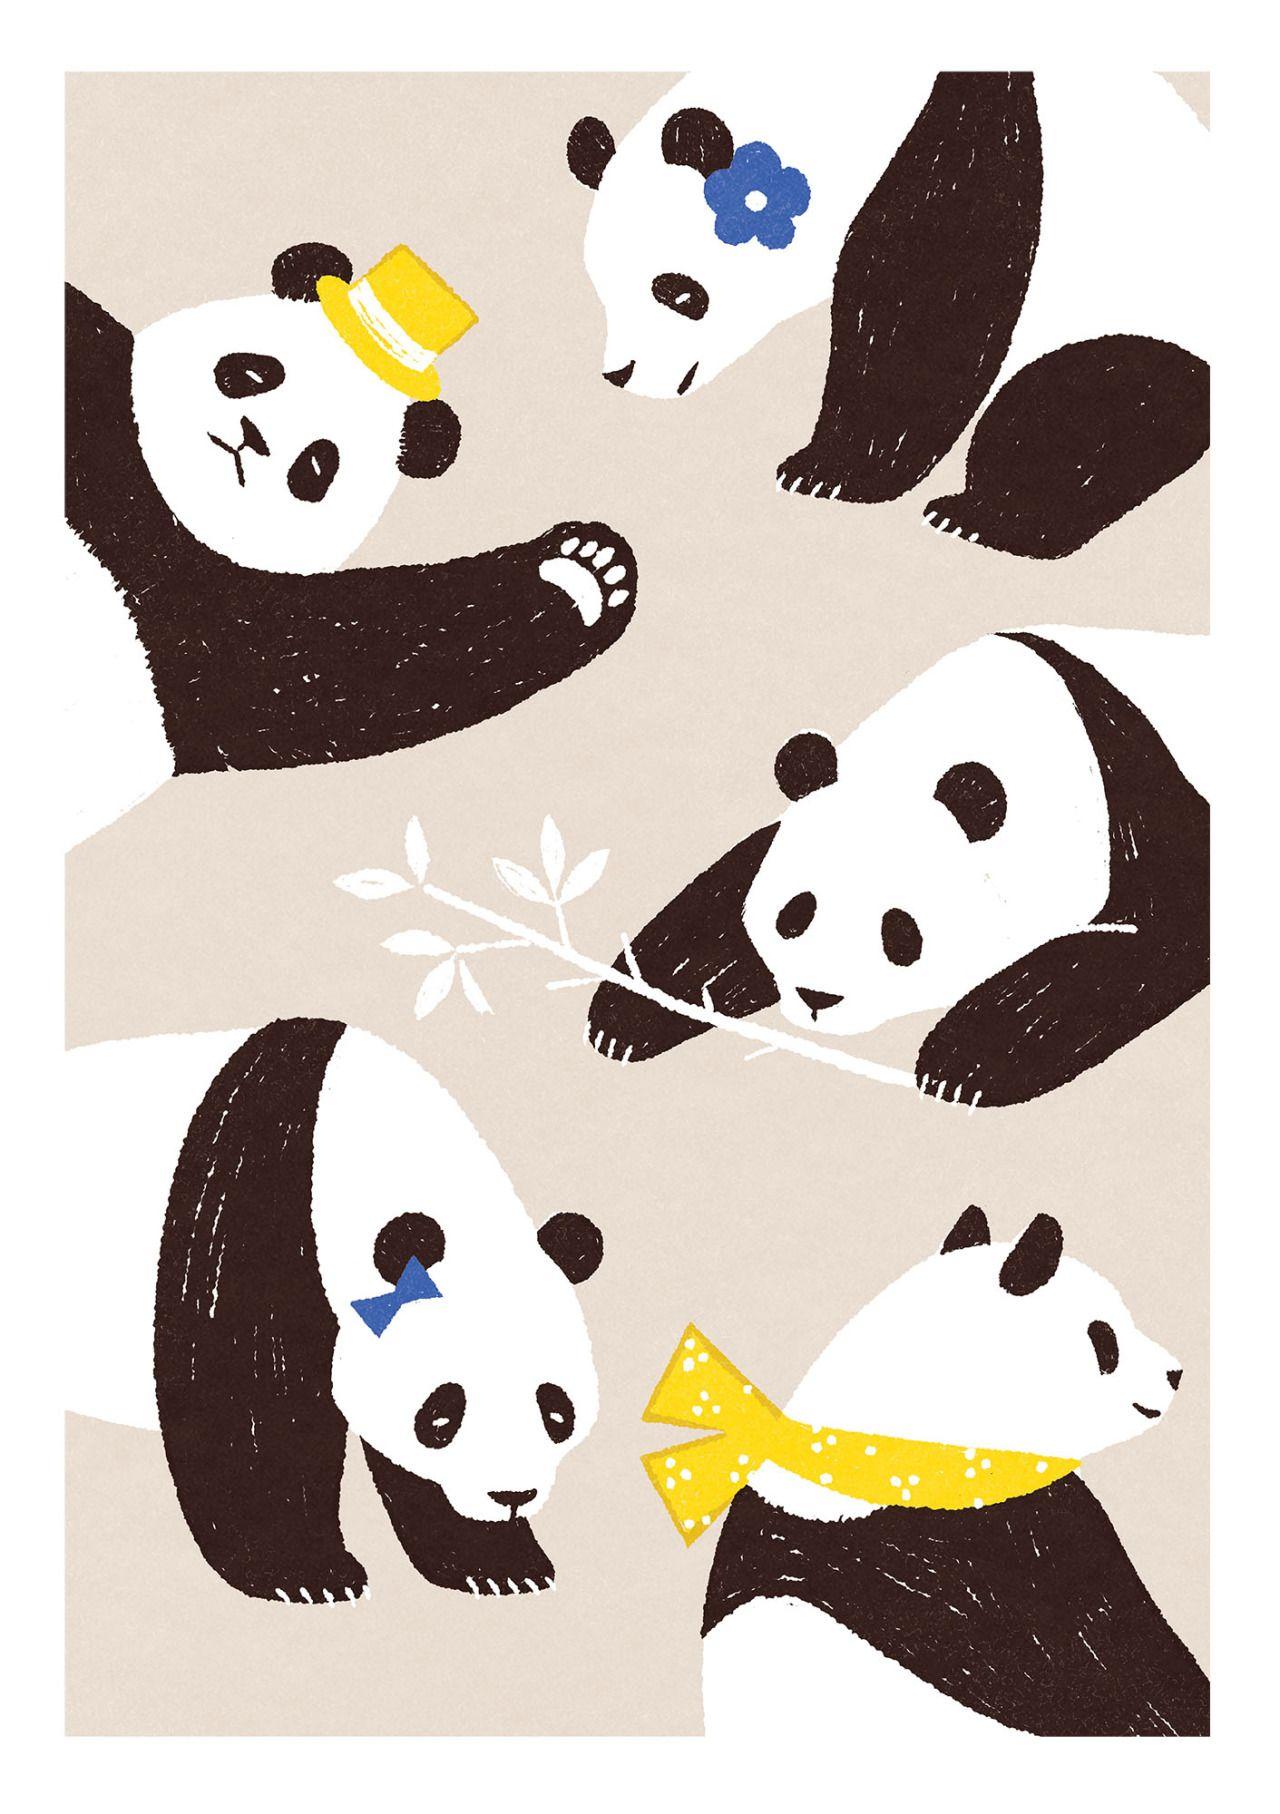 new動物」おしゃれまとめの人気アイデア|pinterest |直子 西岡